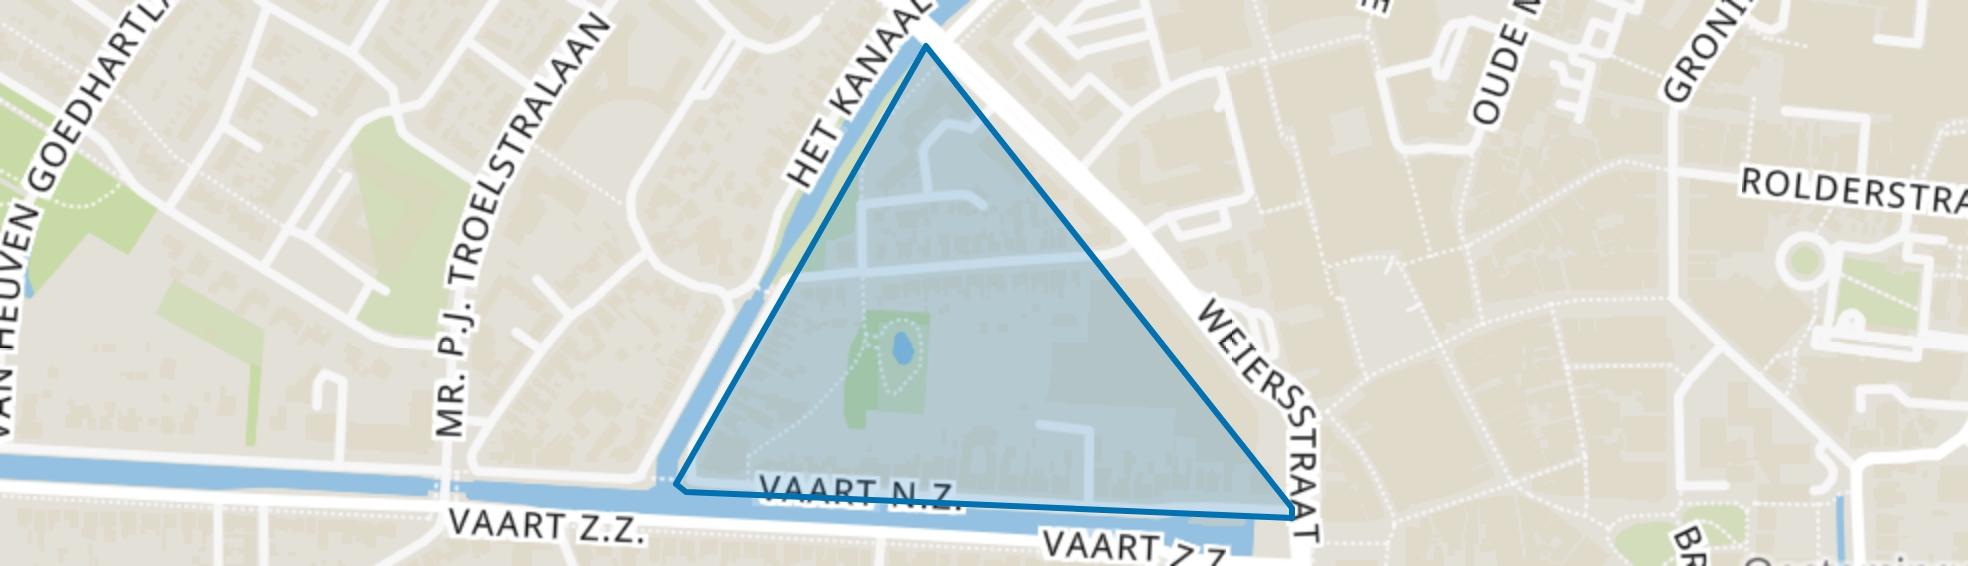 Cultuureelkwartier, Assen map